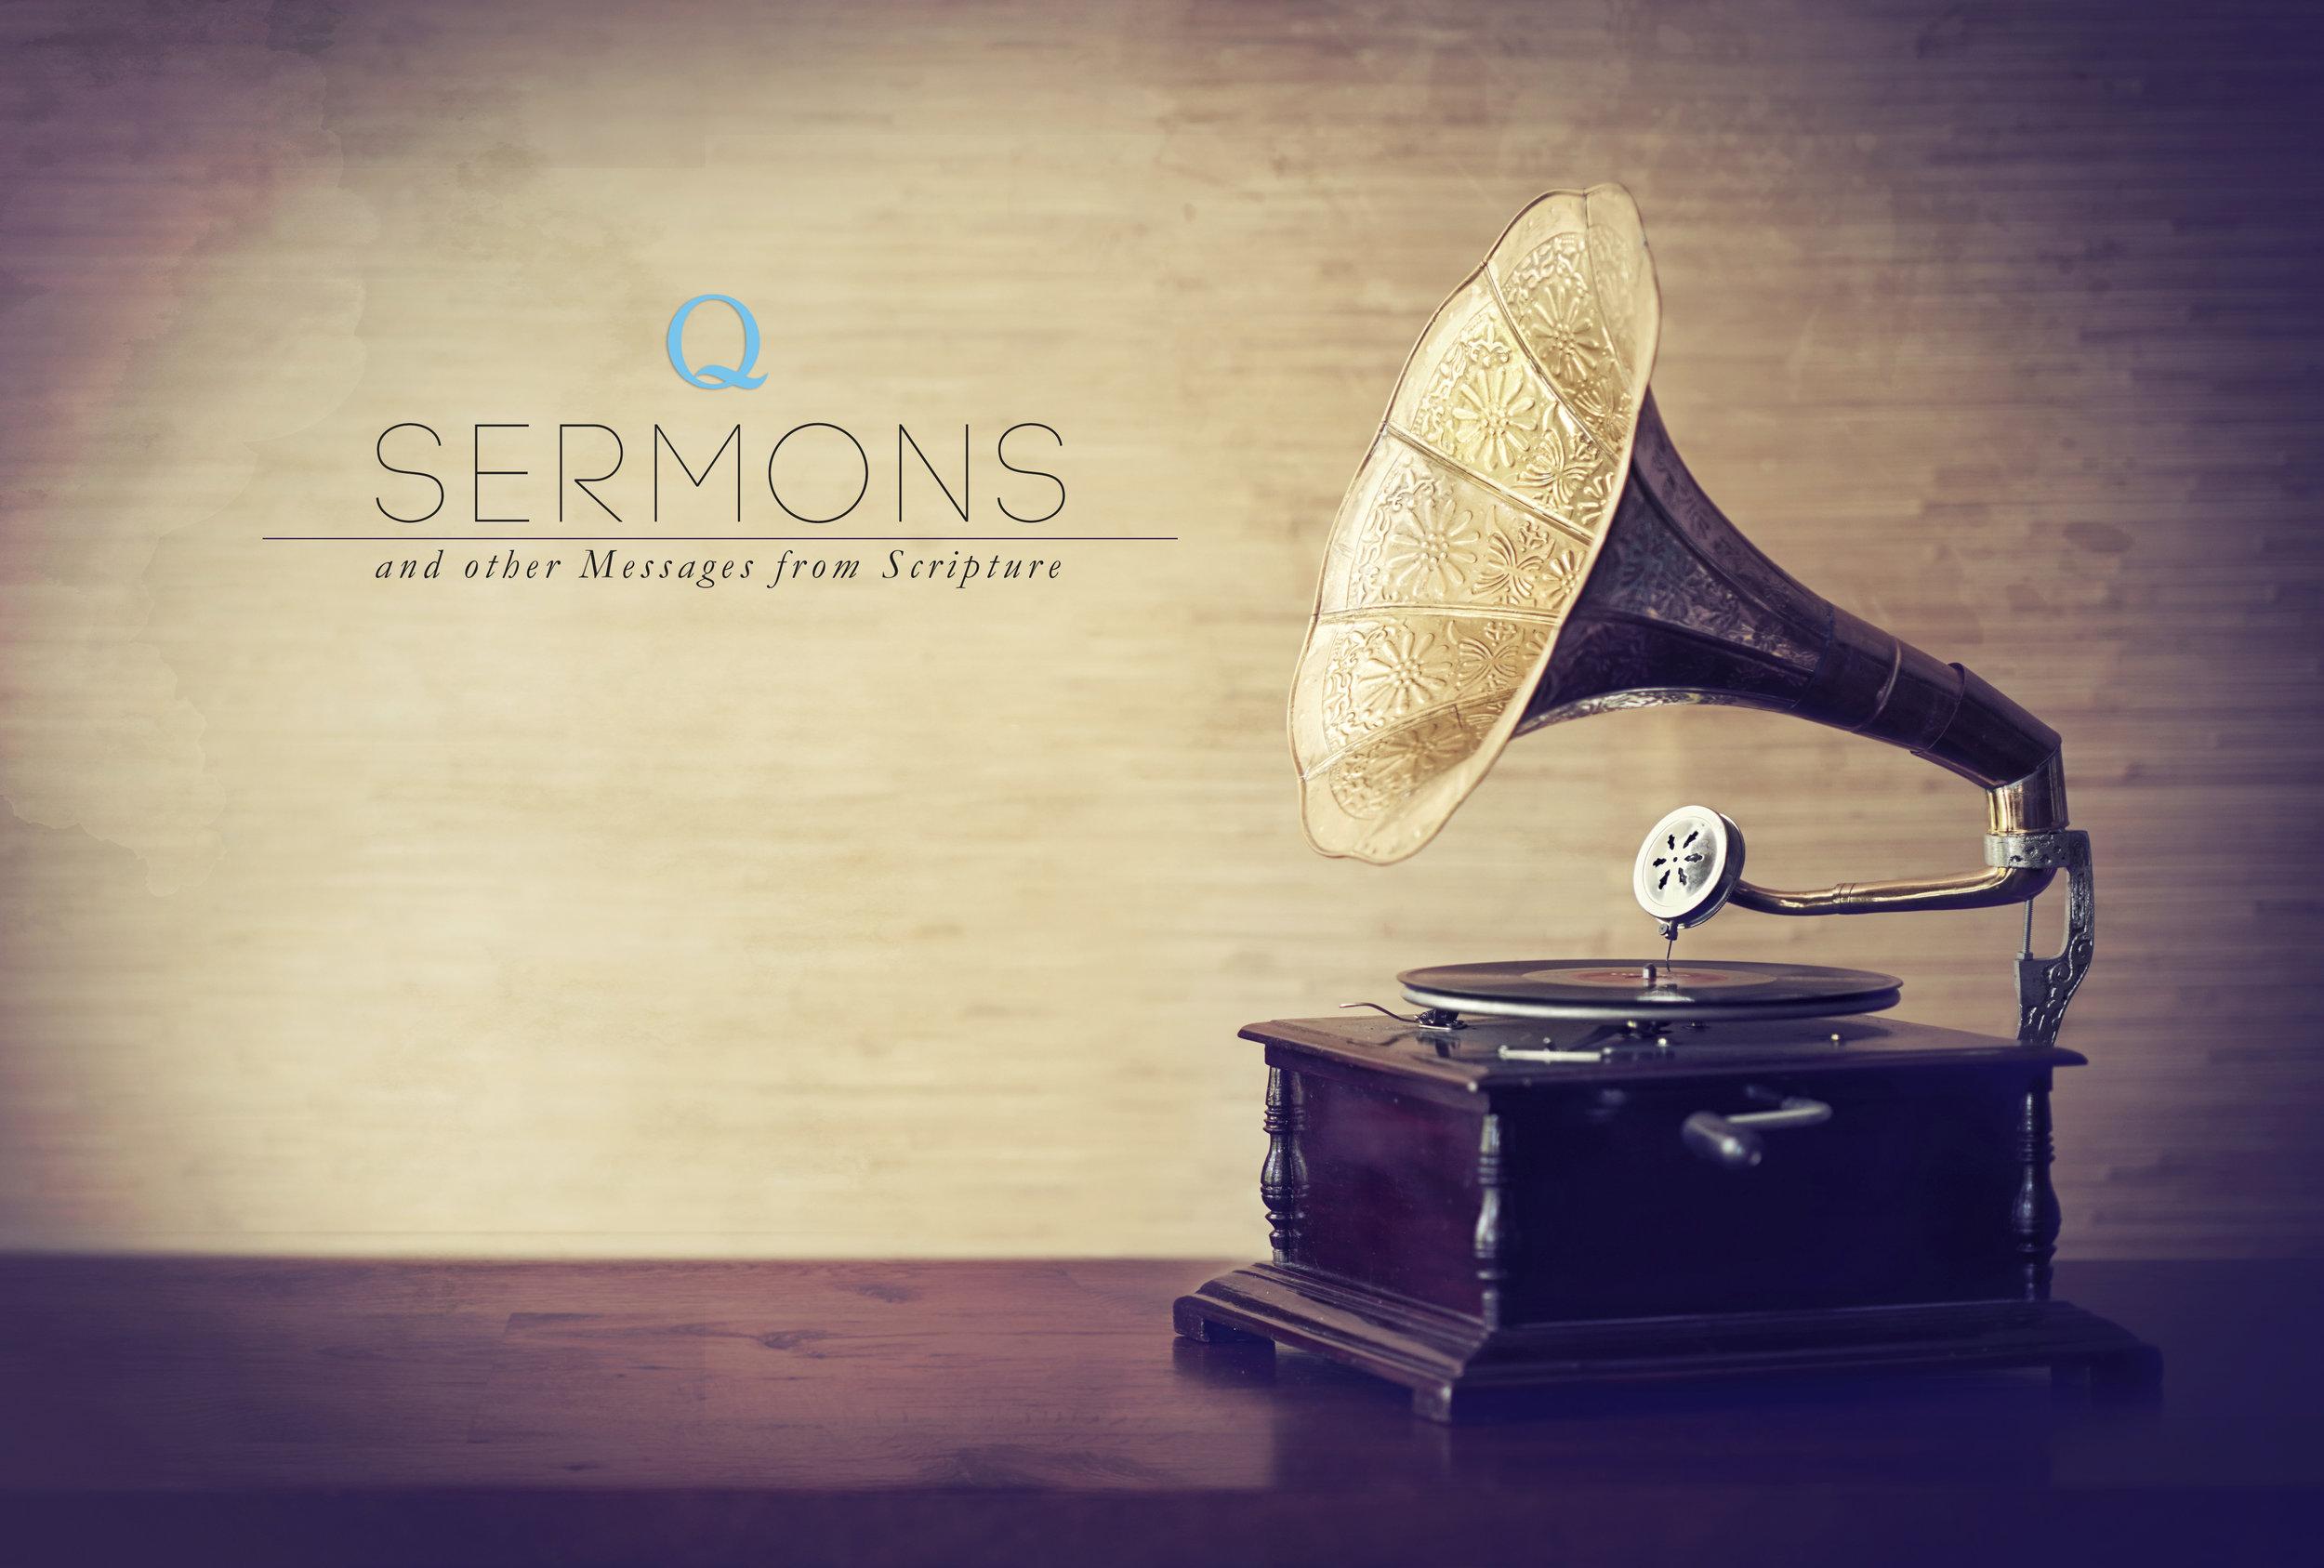 sermons and phonograph.jpg